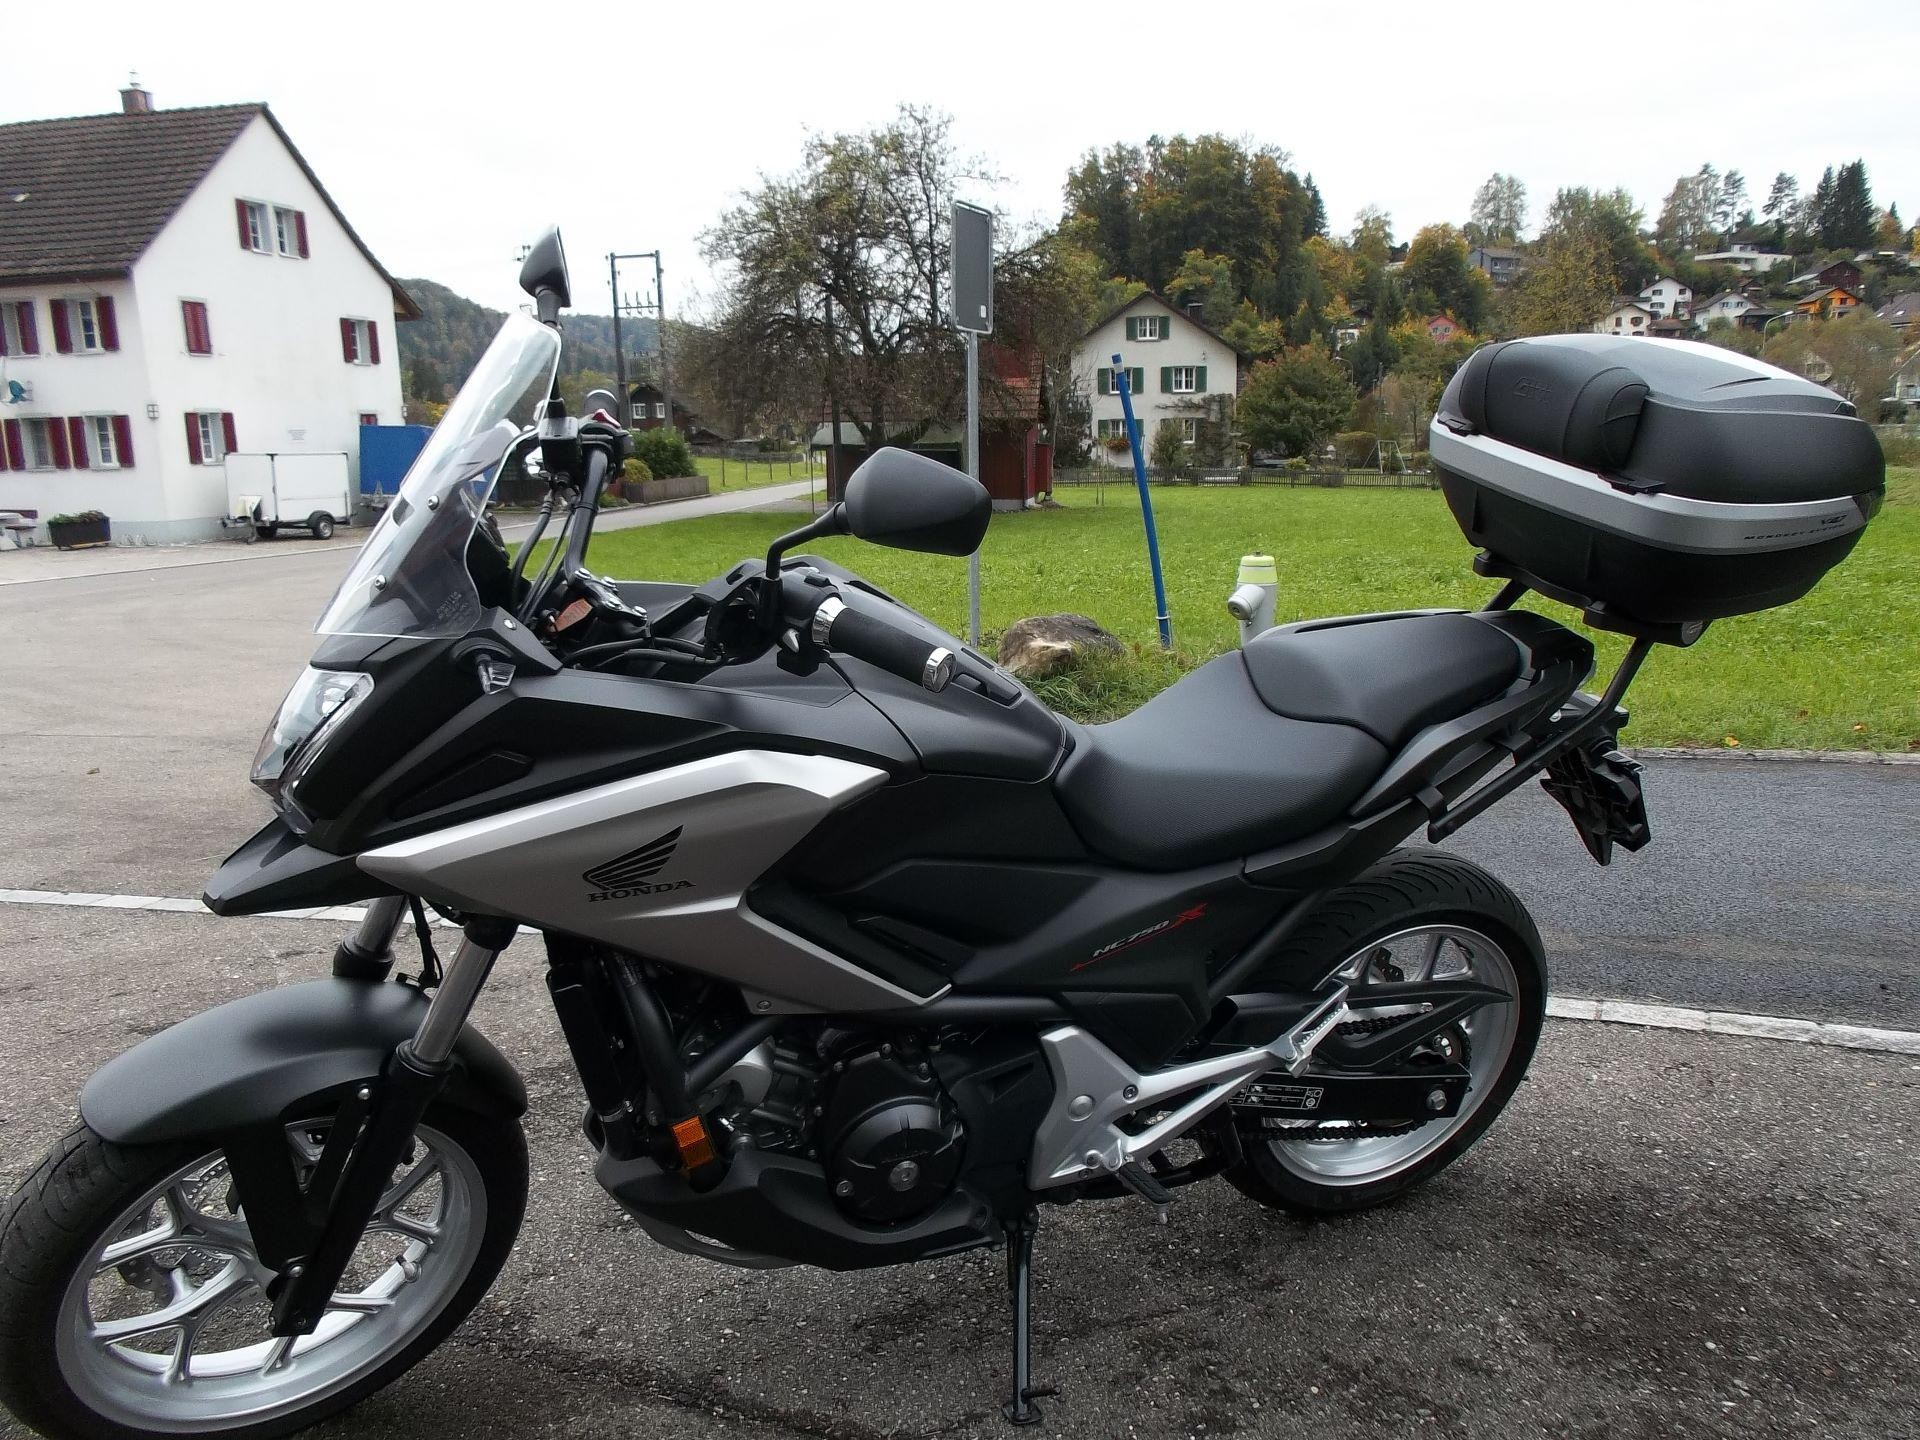 motorrad occasion kaufen honda nc 750 xd abs mit top case stieger motos kollbrunn. Black Bedroom Furniture Sets. Home Design Ideas